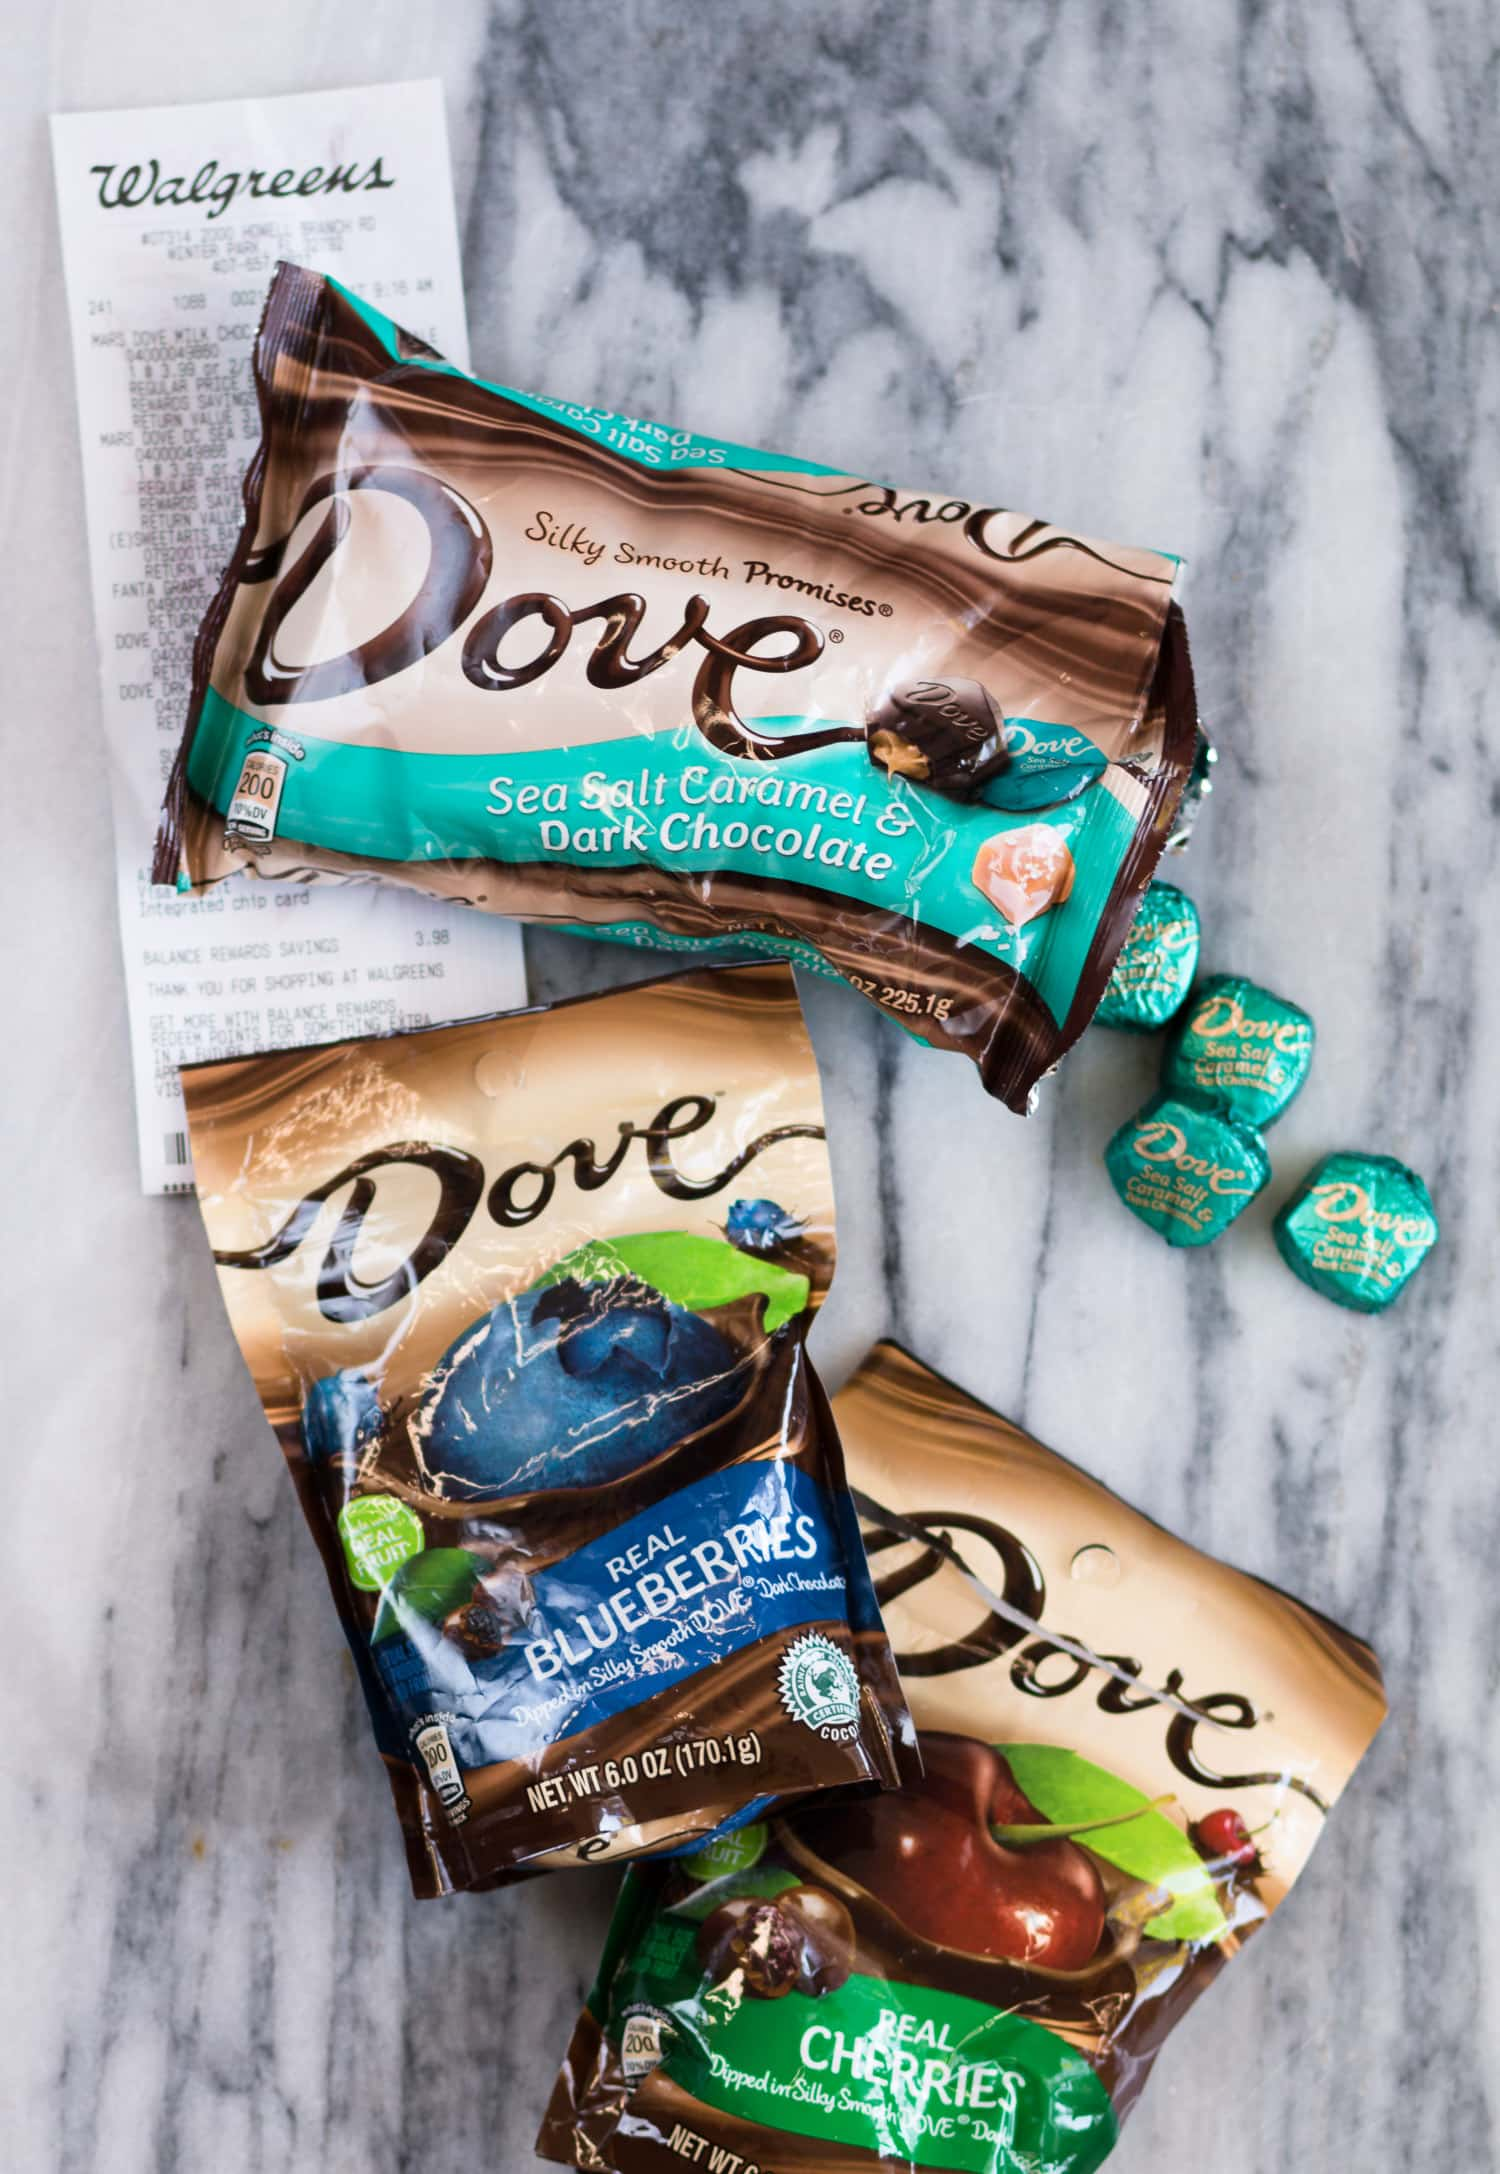 Dove sea salt caramel and dark chocolate squares + chocolate-covered blueberries and chocolate-covered cherries + Dove chocolate coupon at Walgreens